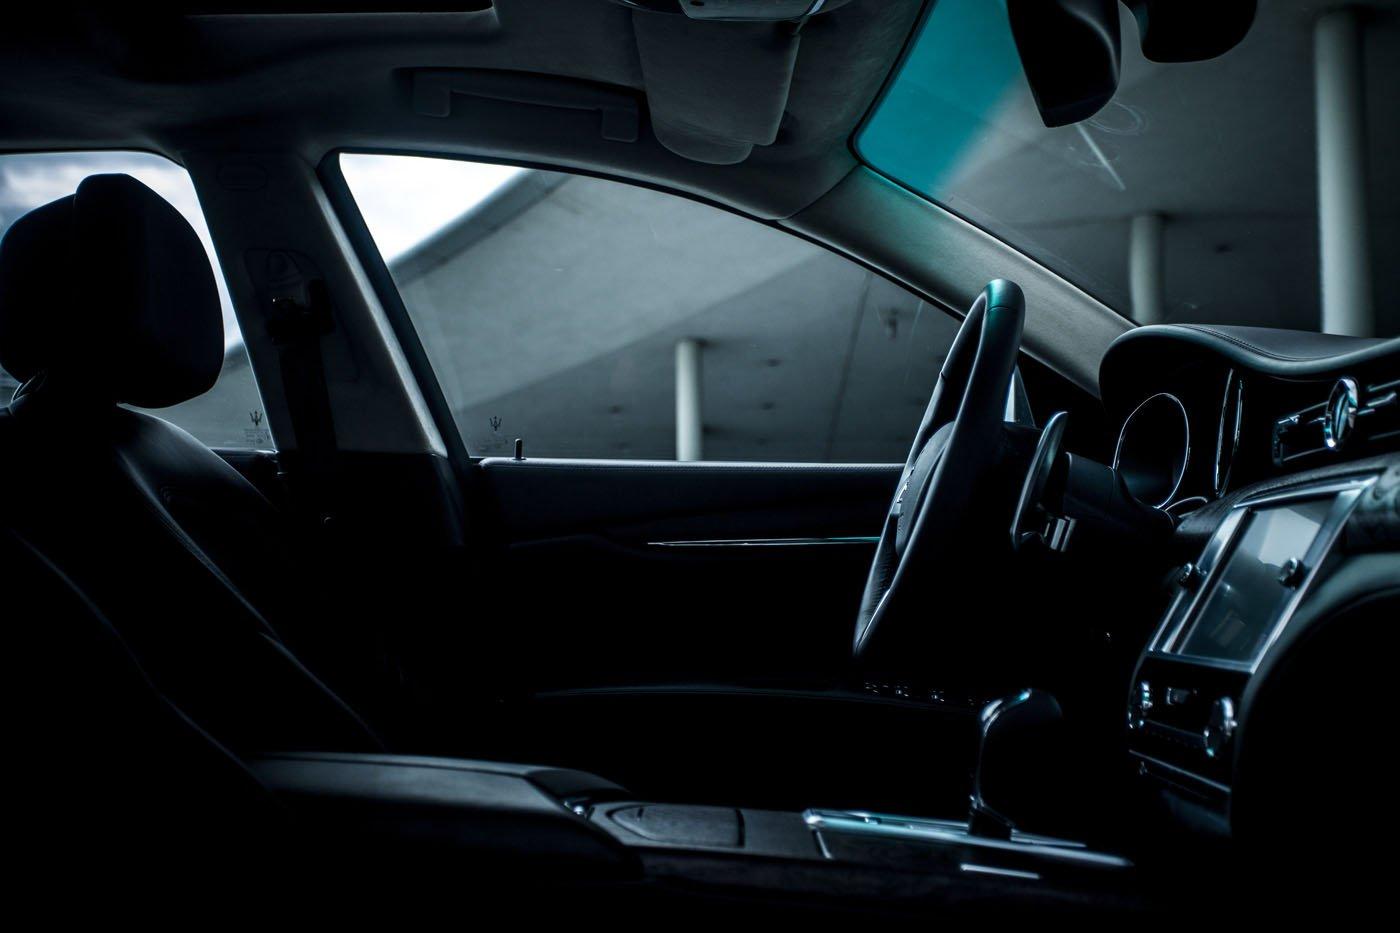 Maserati Quattroporte GTS 2013 Autogespot Autofotografie Interieur